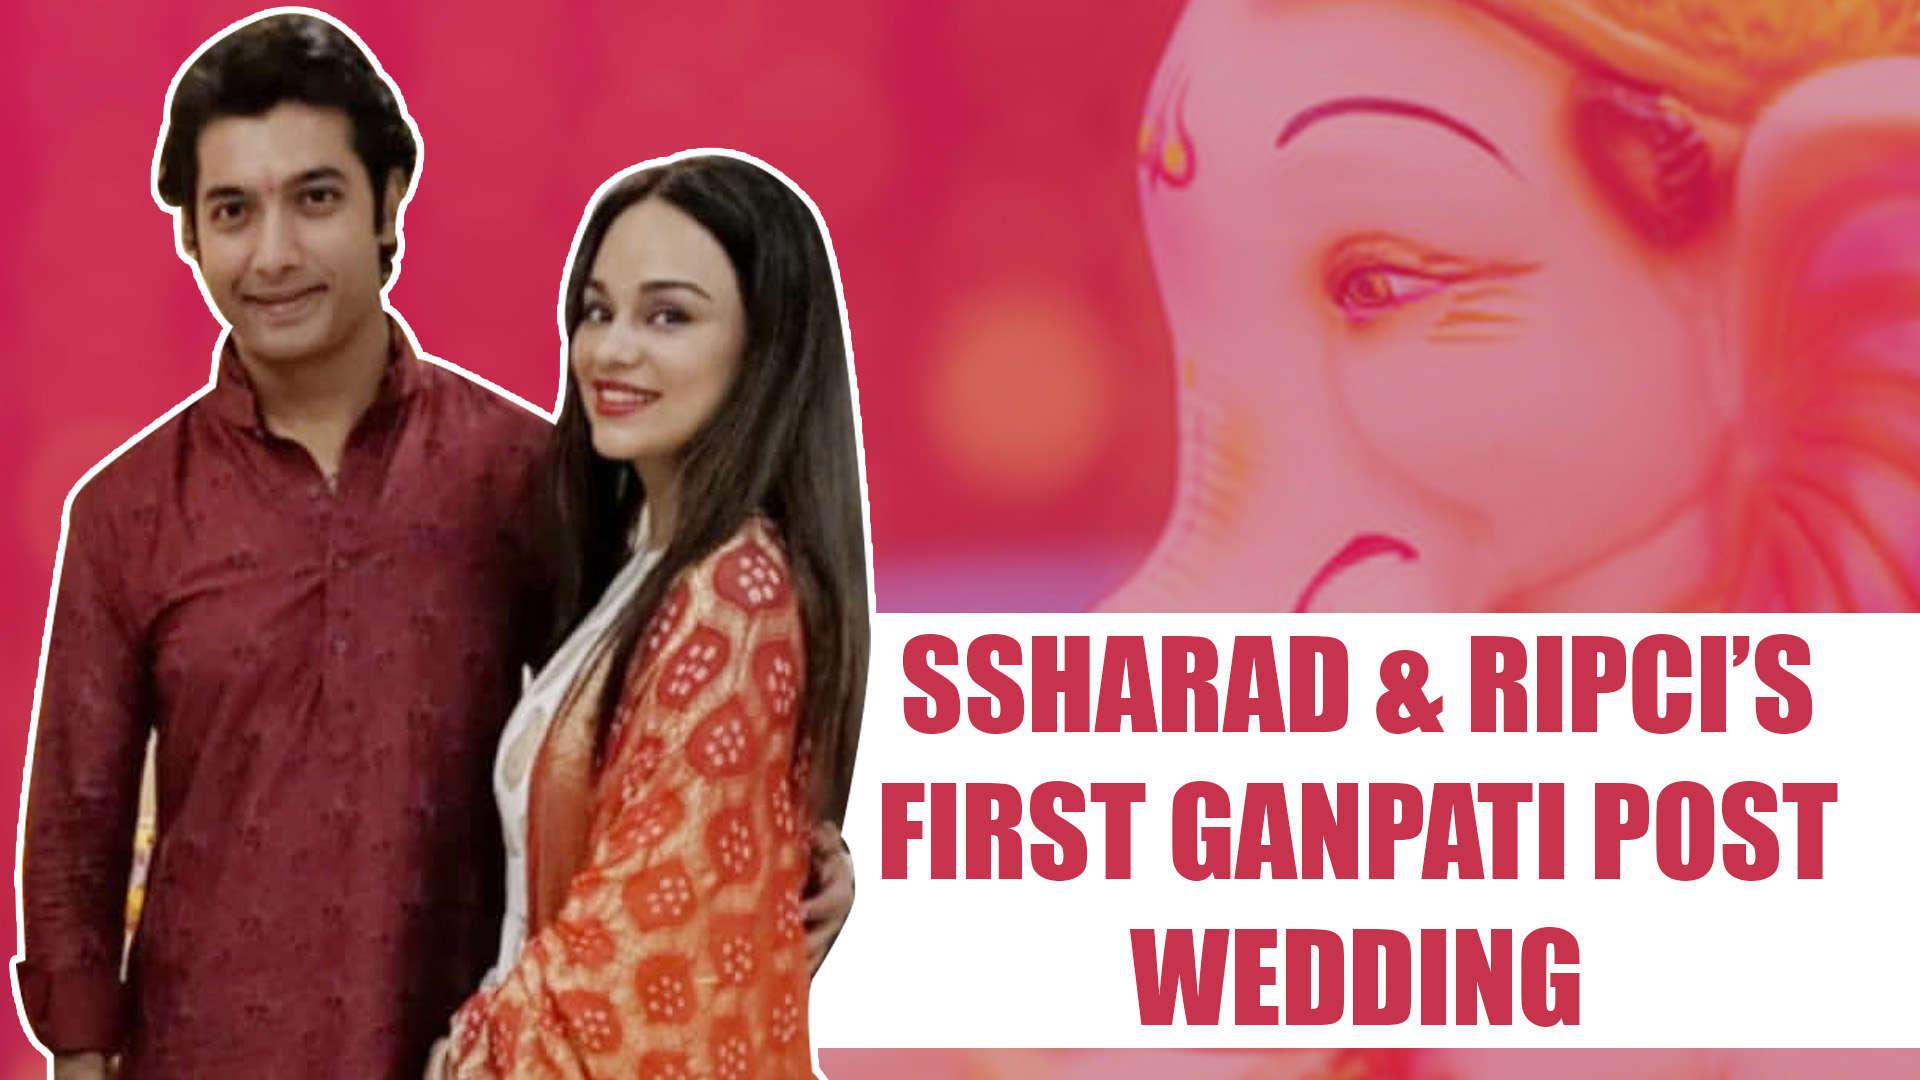 Ssharad Malhotra celebrates his first Ganpati post wedding with wife Ripci  Bhatia